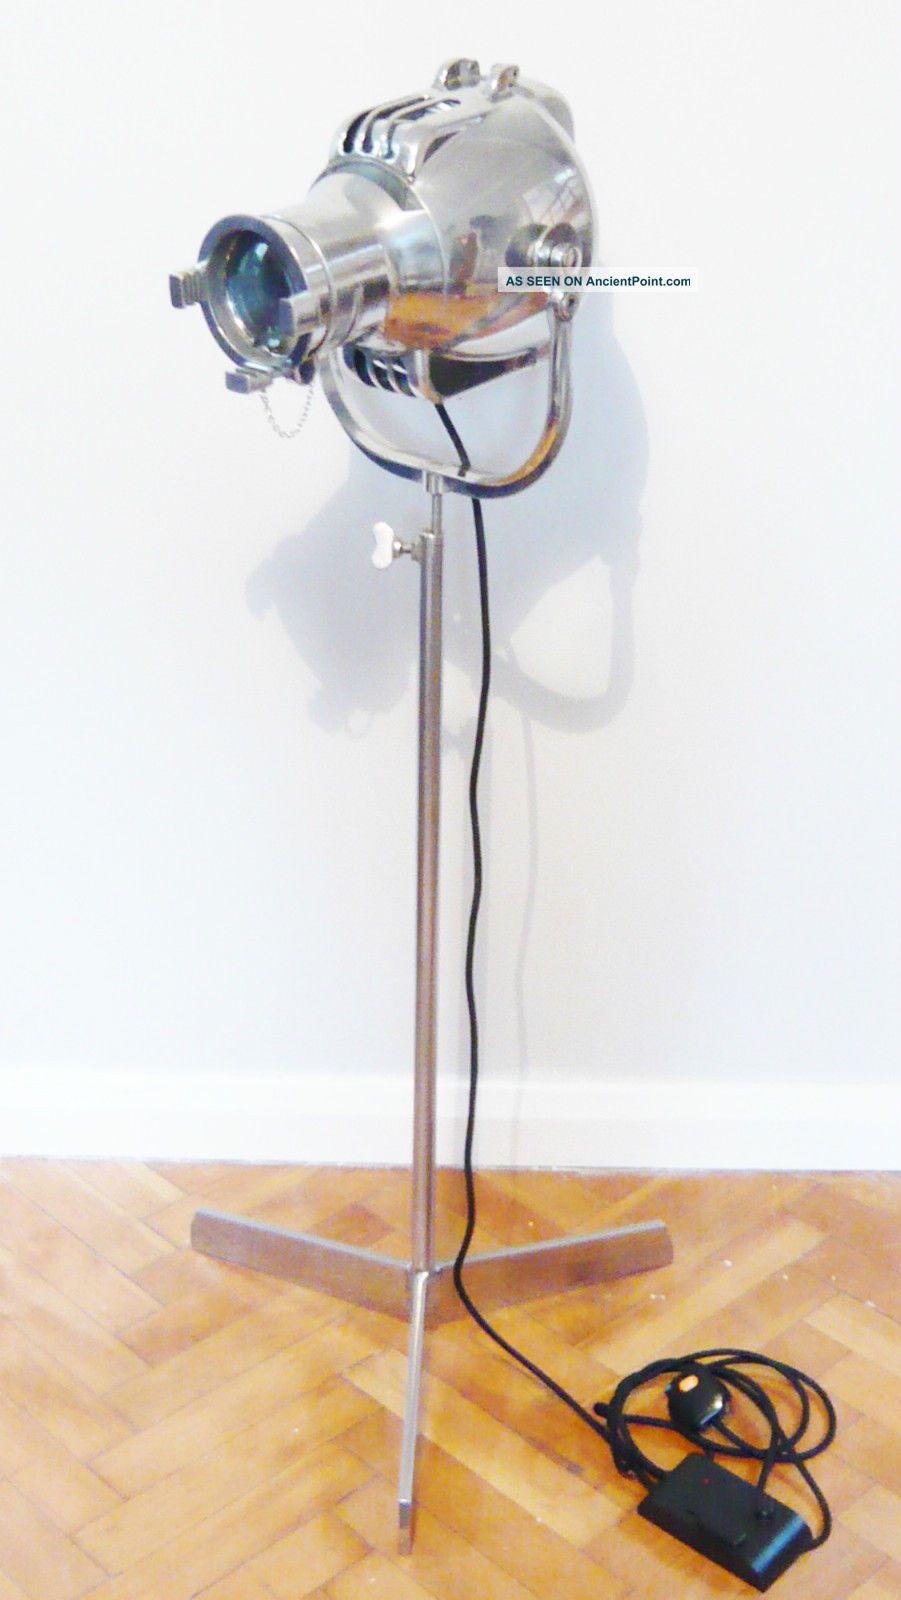 1950s Vintage Theatre Light Studio Floor Industrial Lamp Alessi Eames Bauhaus Uncategorized photo